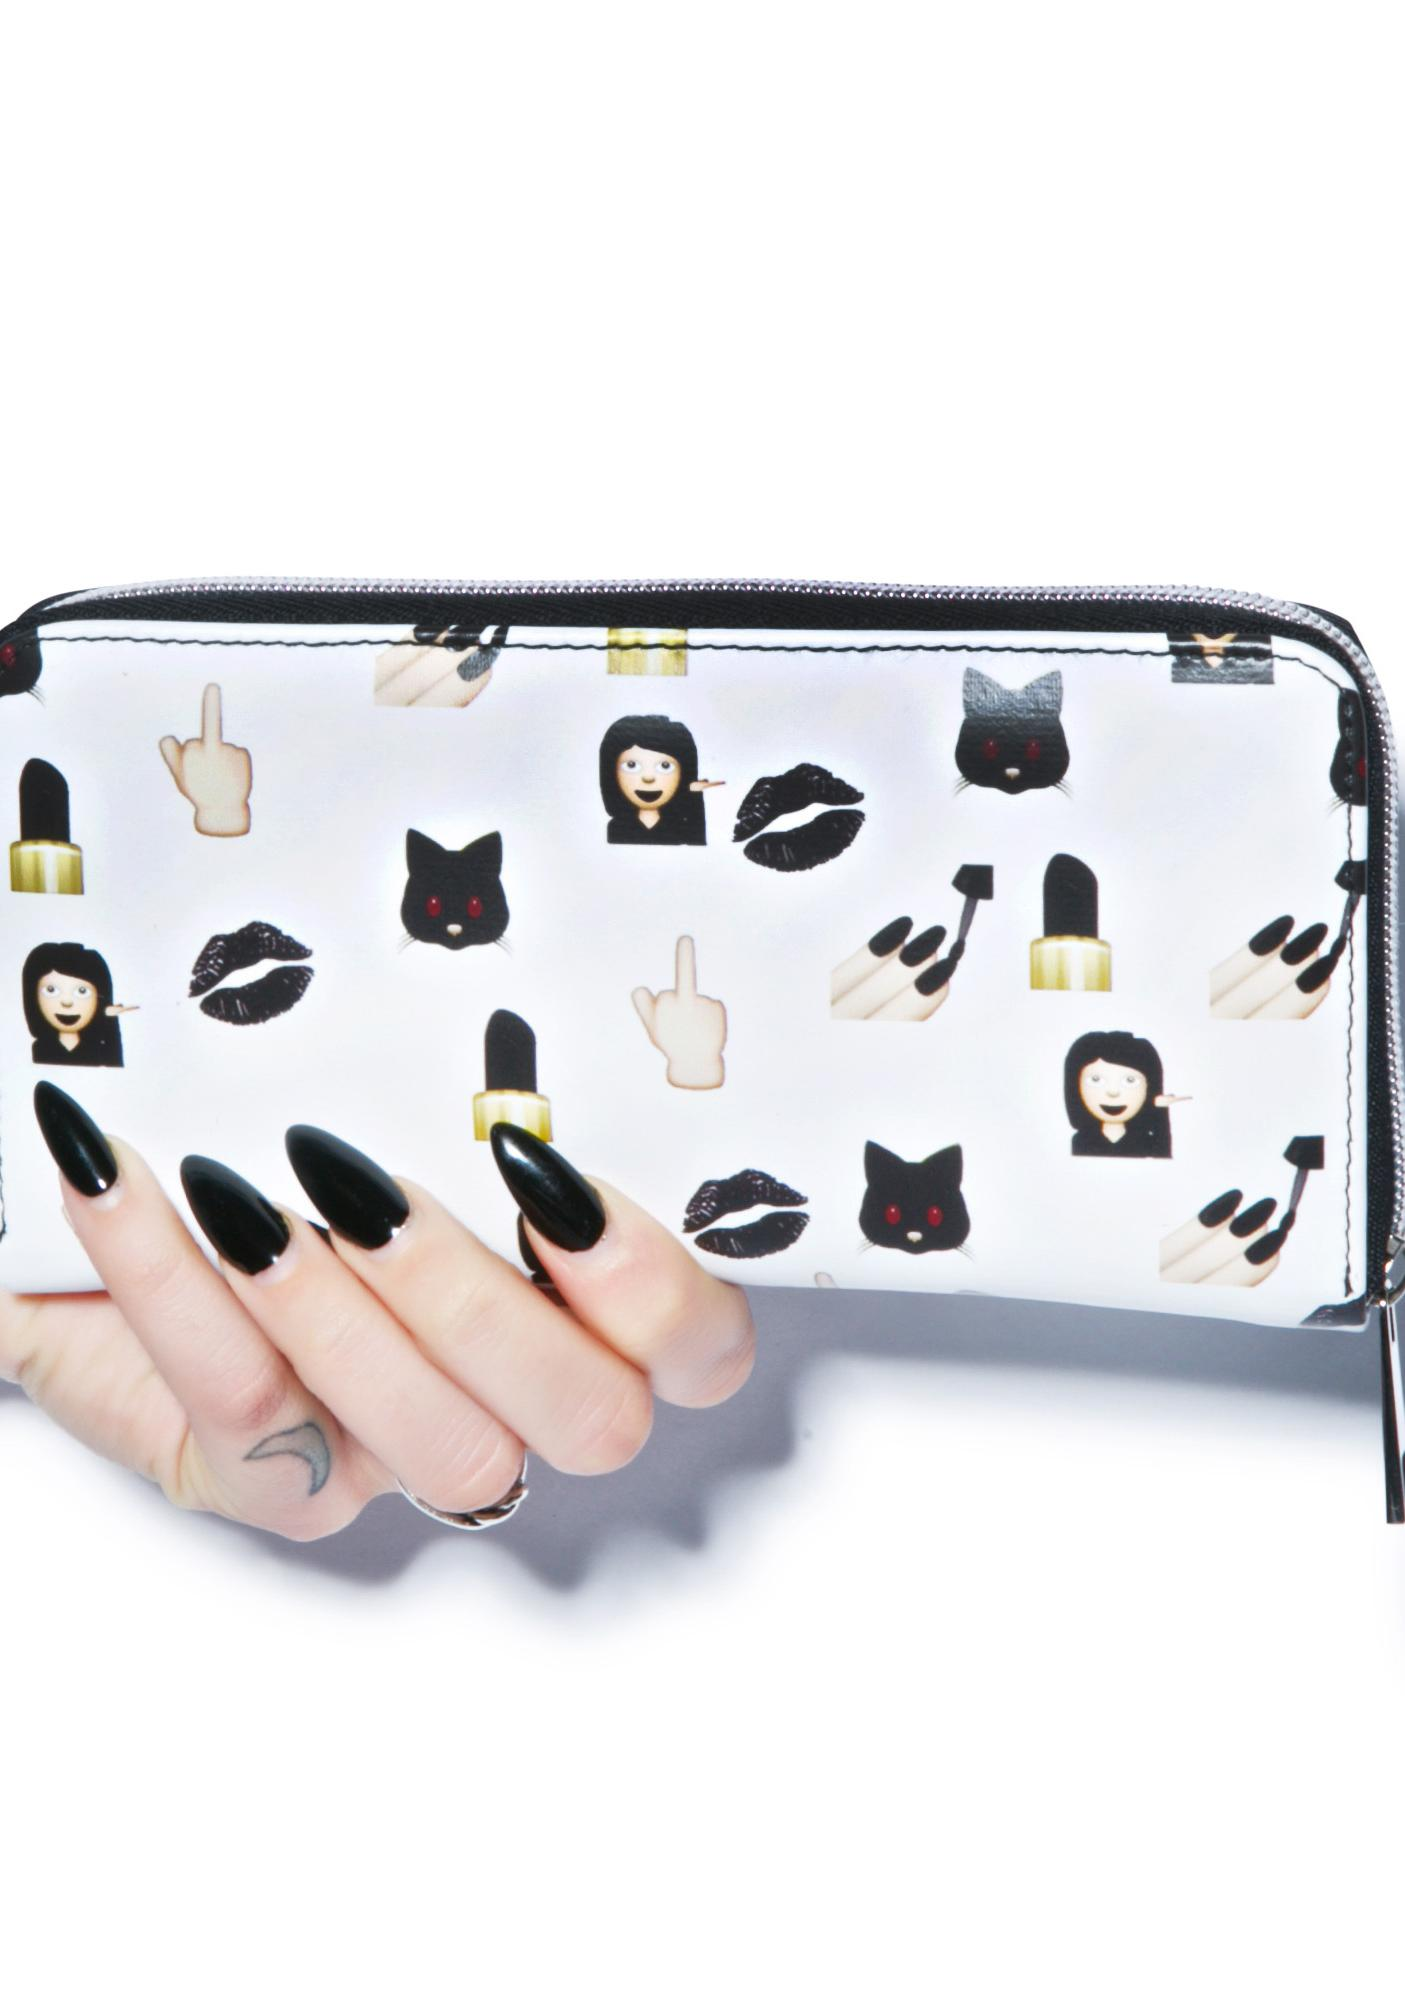 O Mighty Bad Bish Emoji Wallet